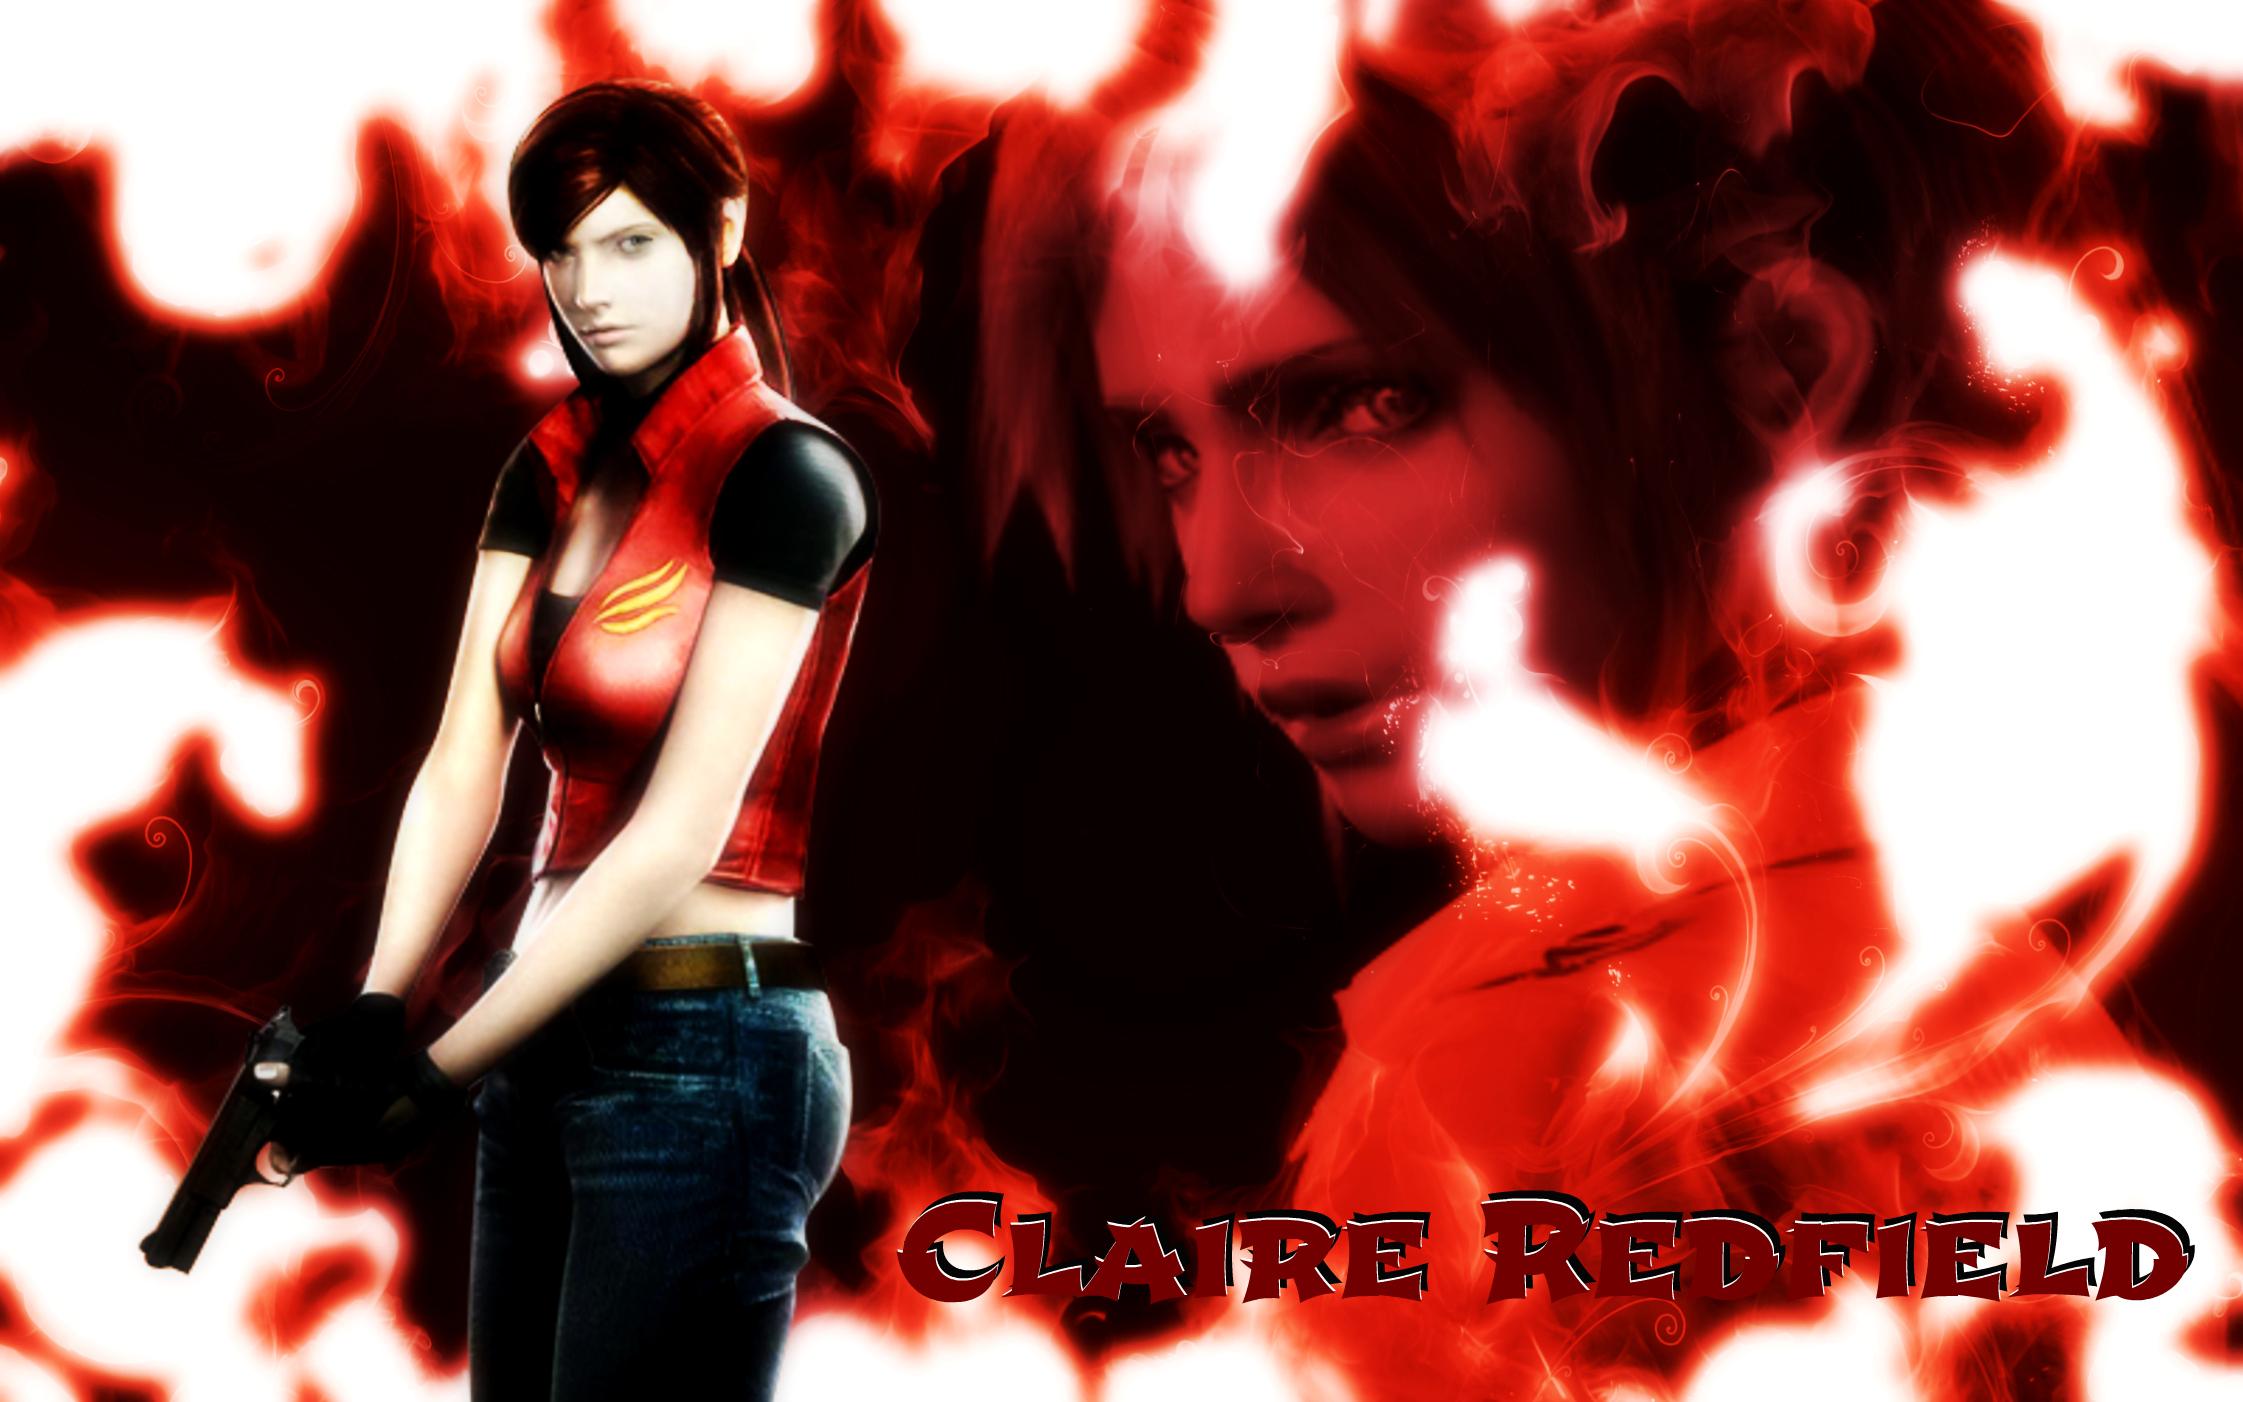 Claire redfield by mrleonre4 2243x1402